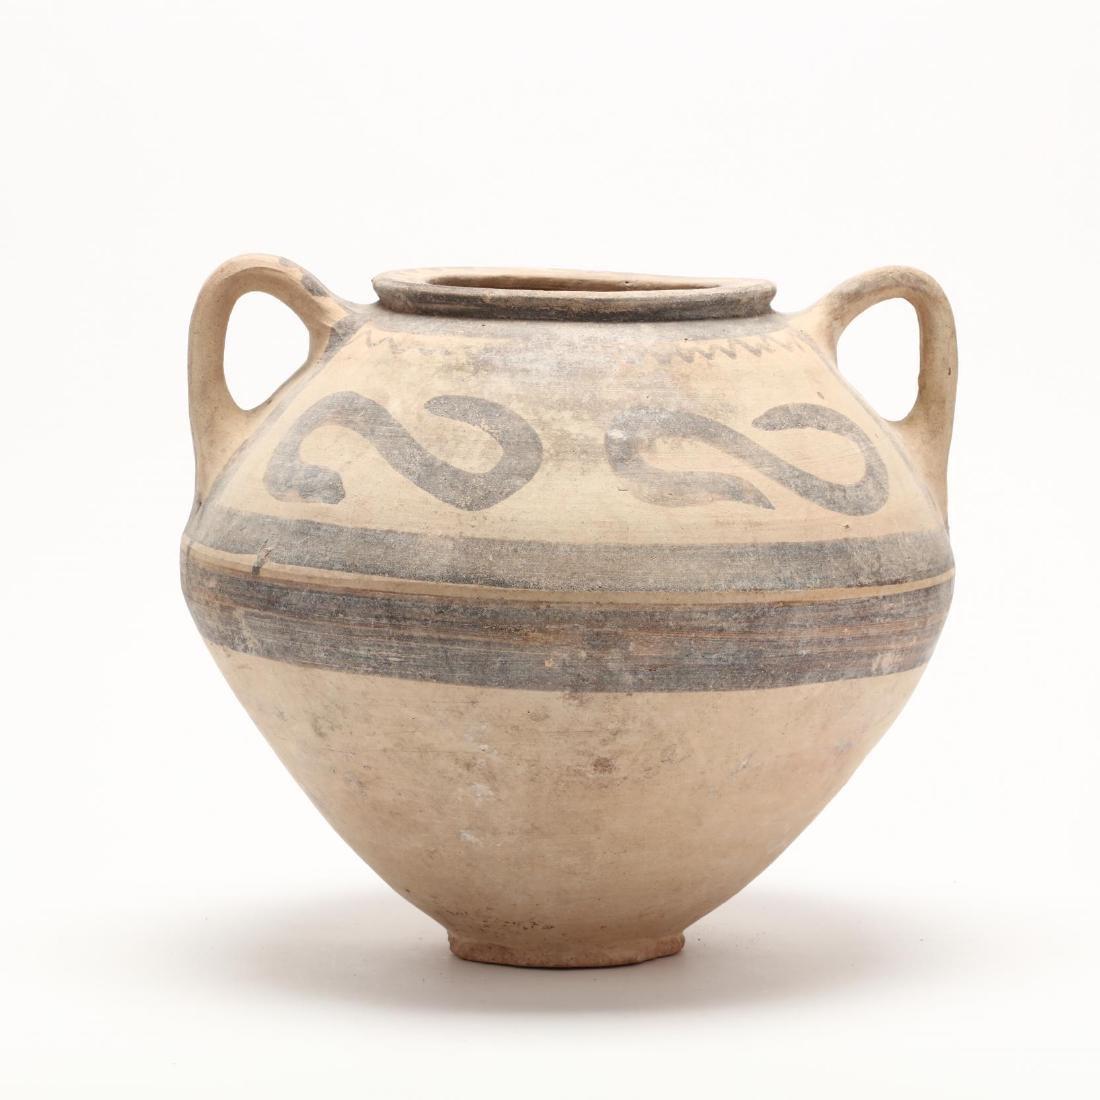 Cypro-Archaic Bichrome Large Jar - 4